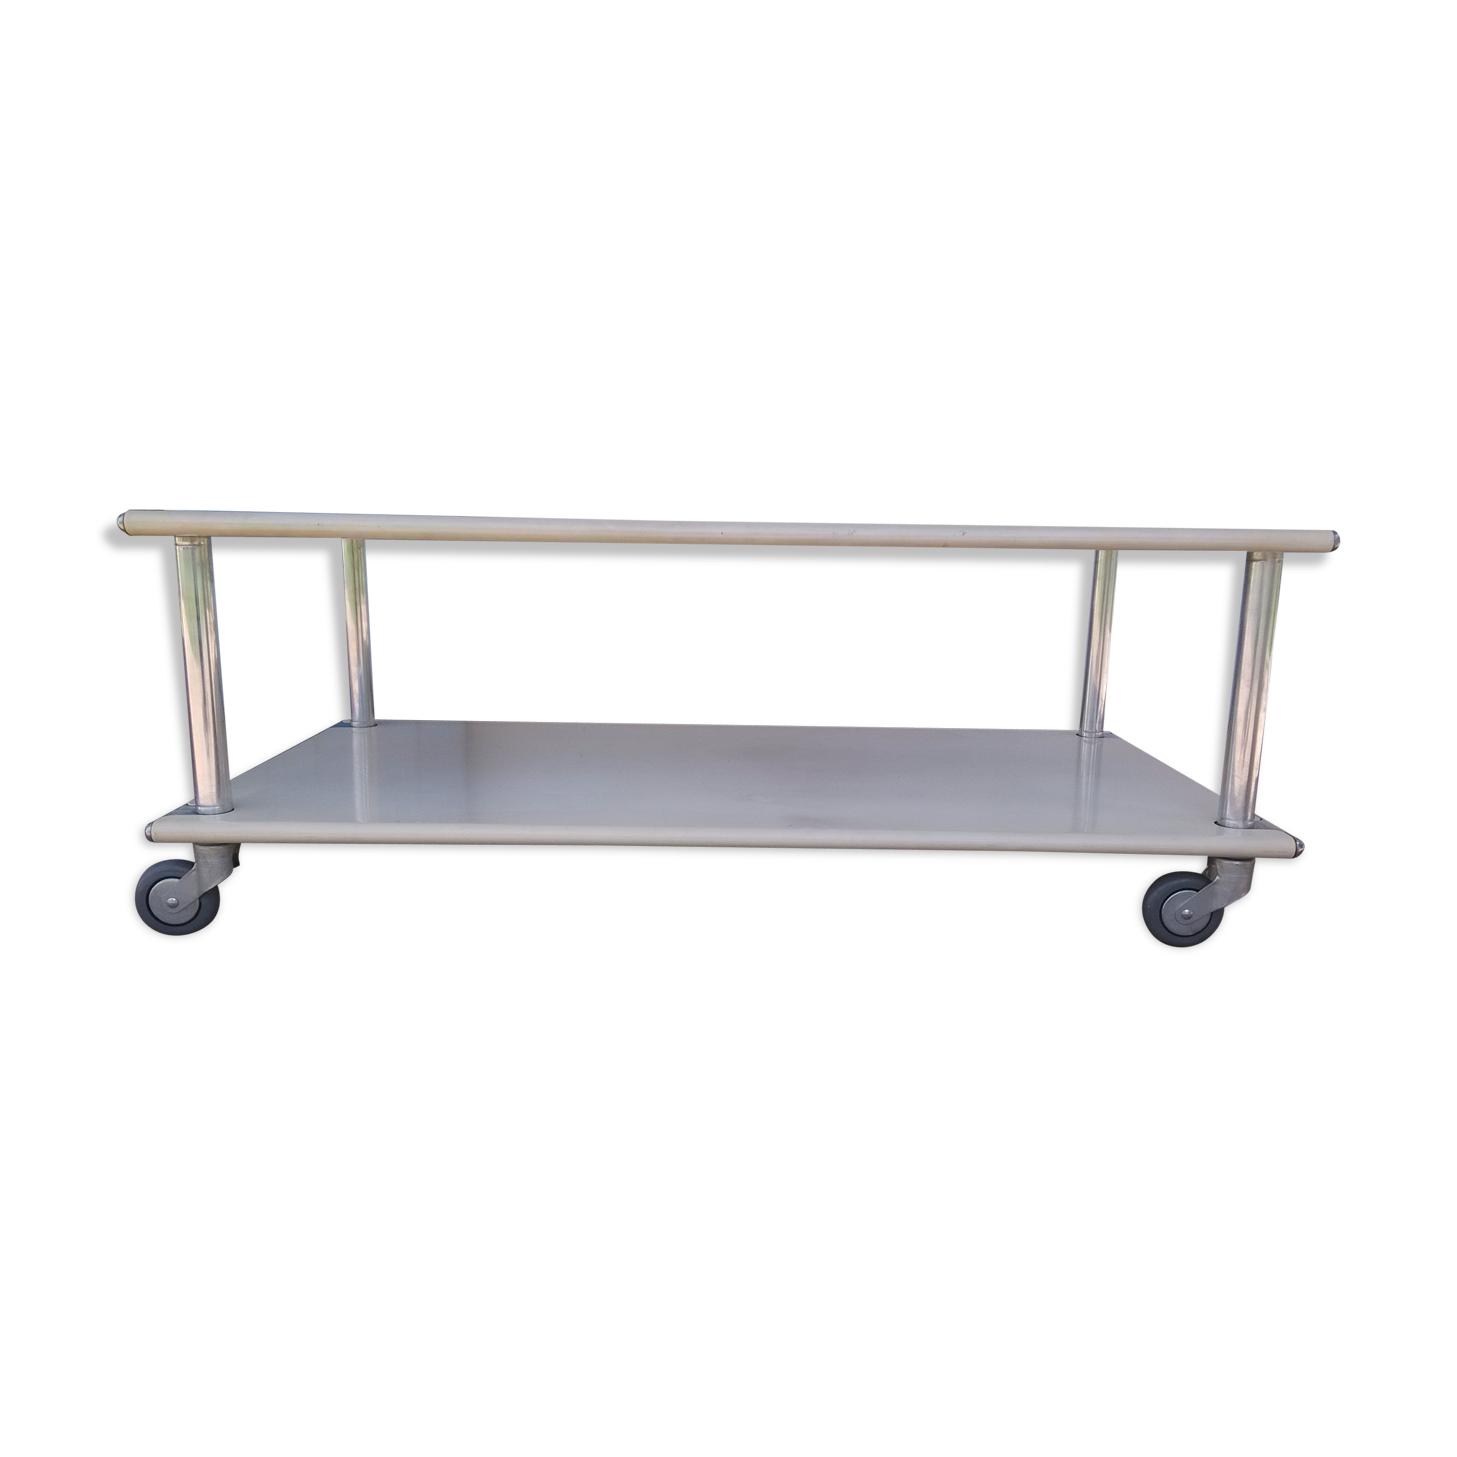 Table basse design industriel